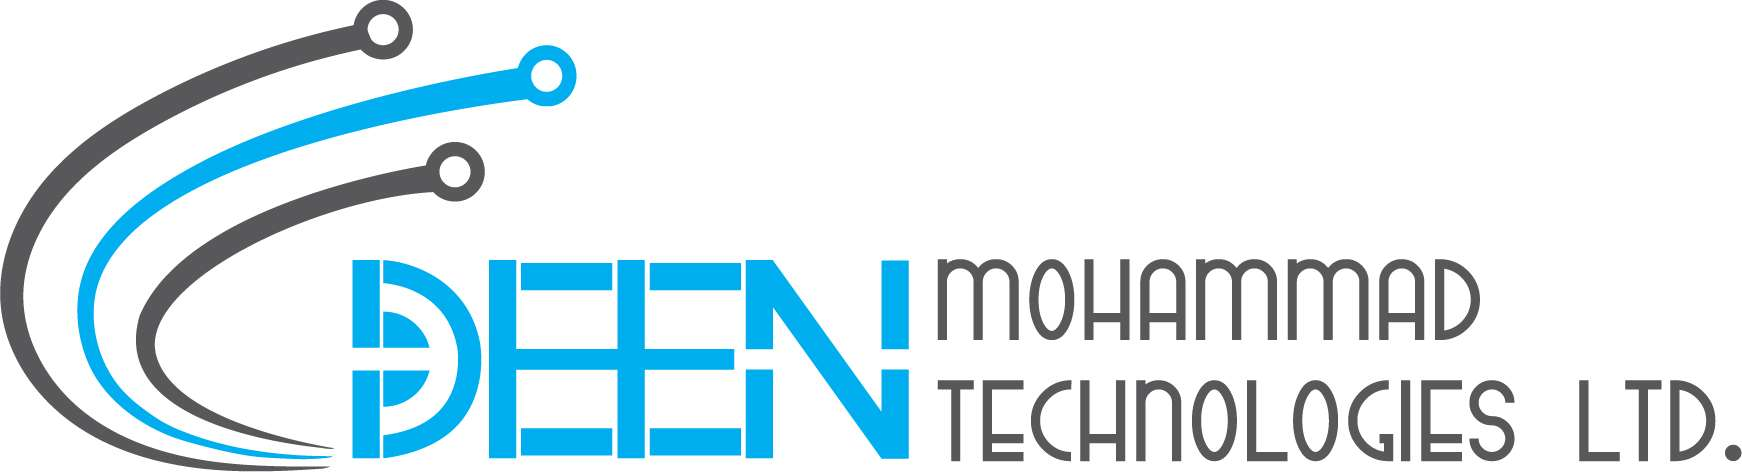 Deem Mohammad Technologies Ltd. Logo